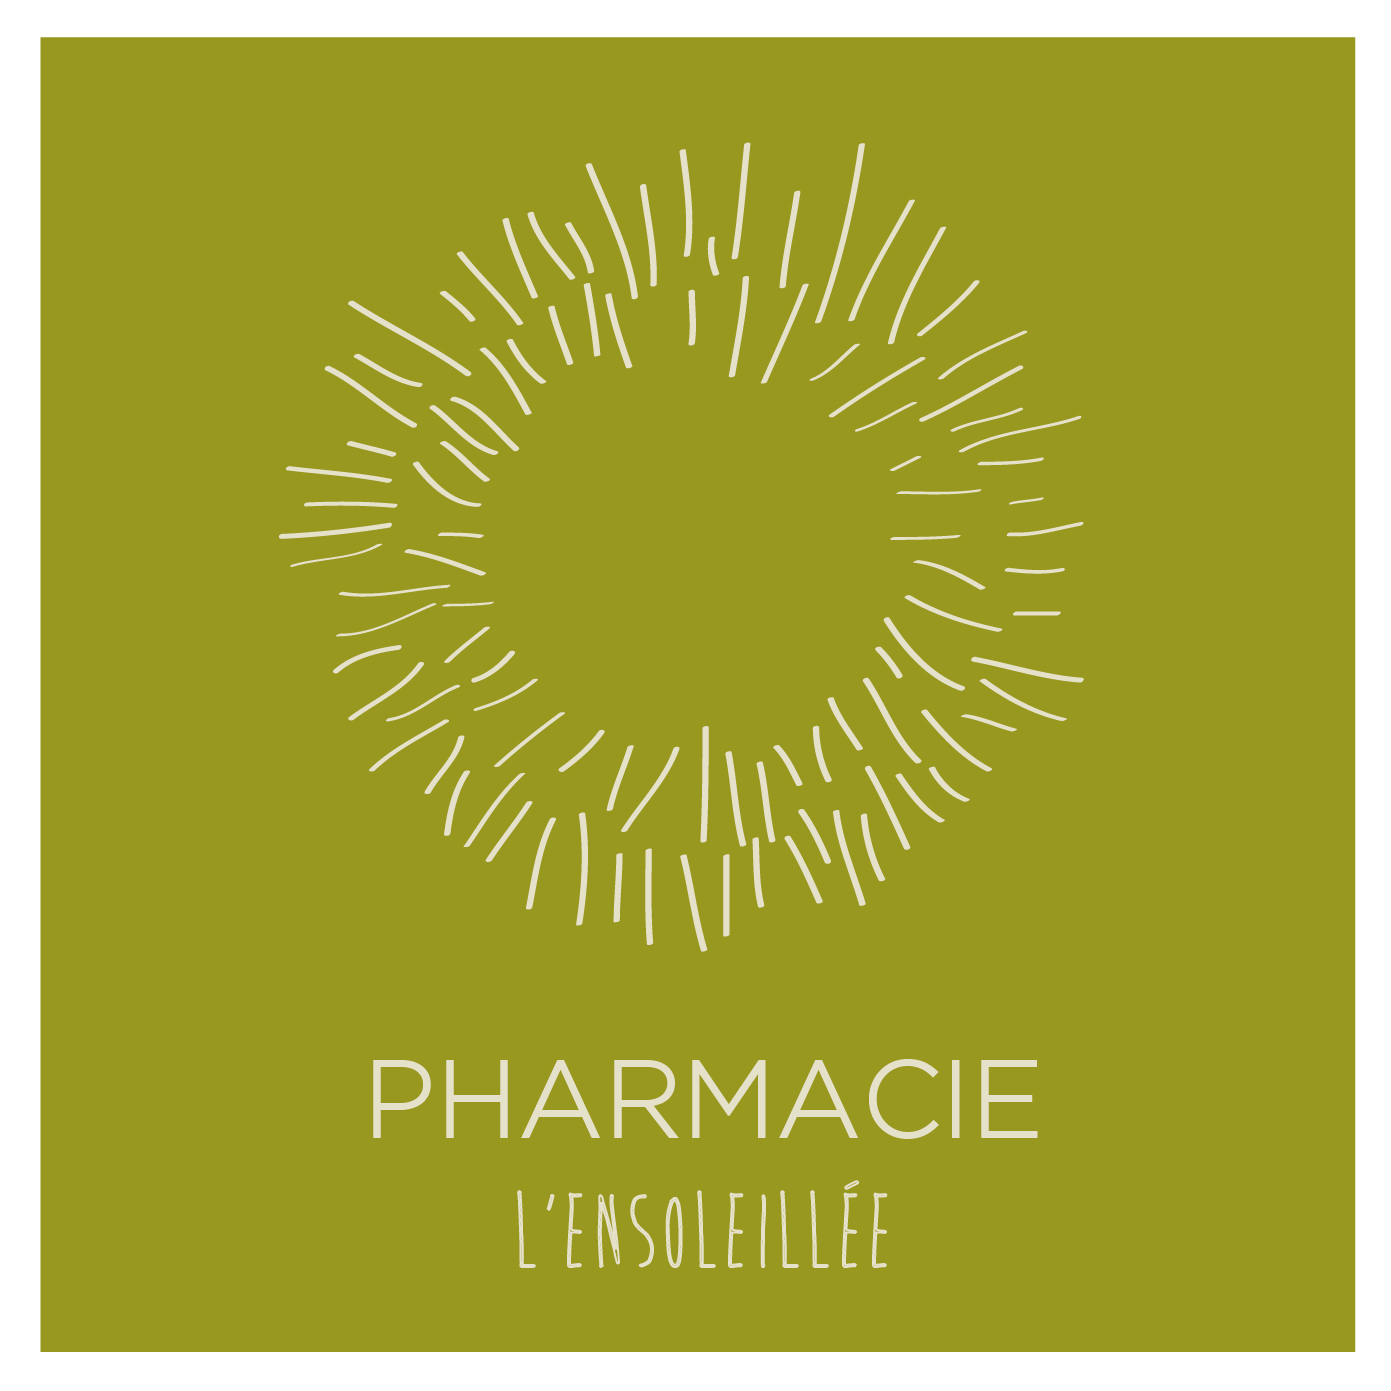 PHARMACIE L'ENSOLEILLEE –  AIX EN PROVENCE (13) 26